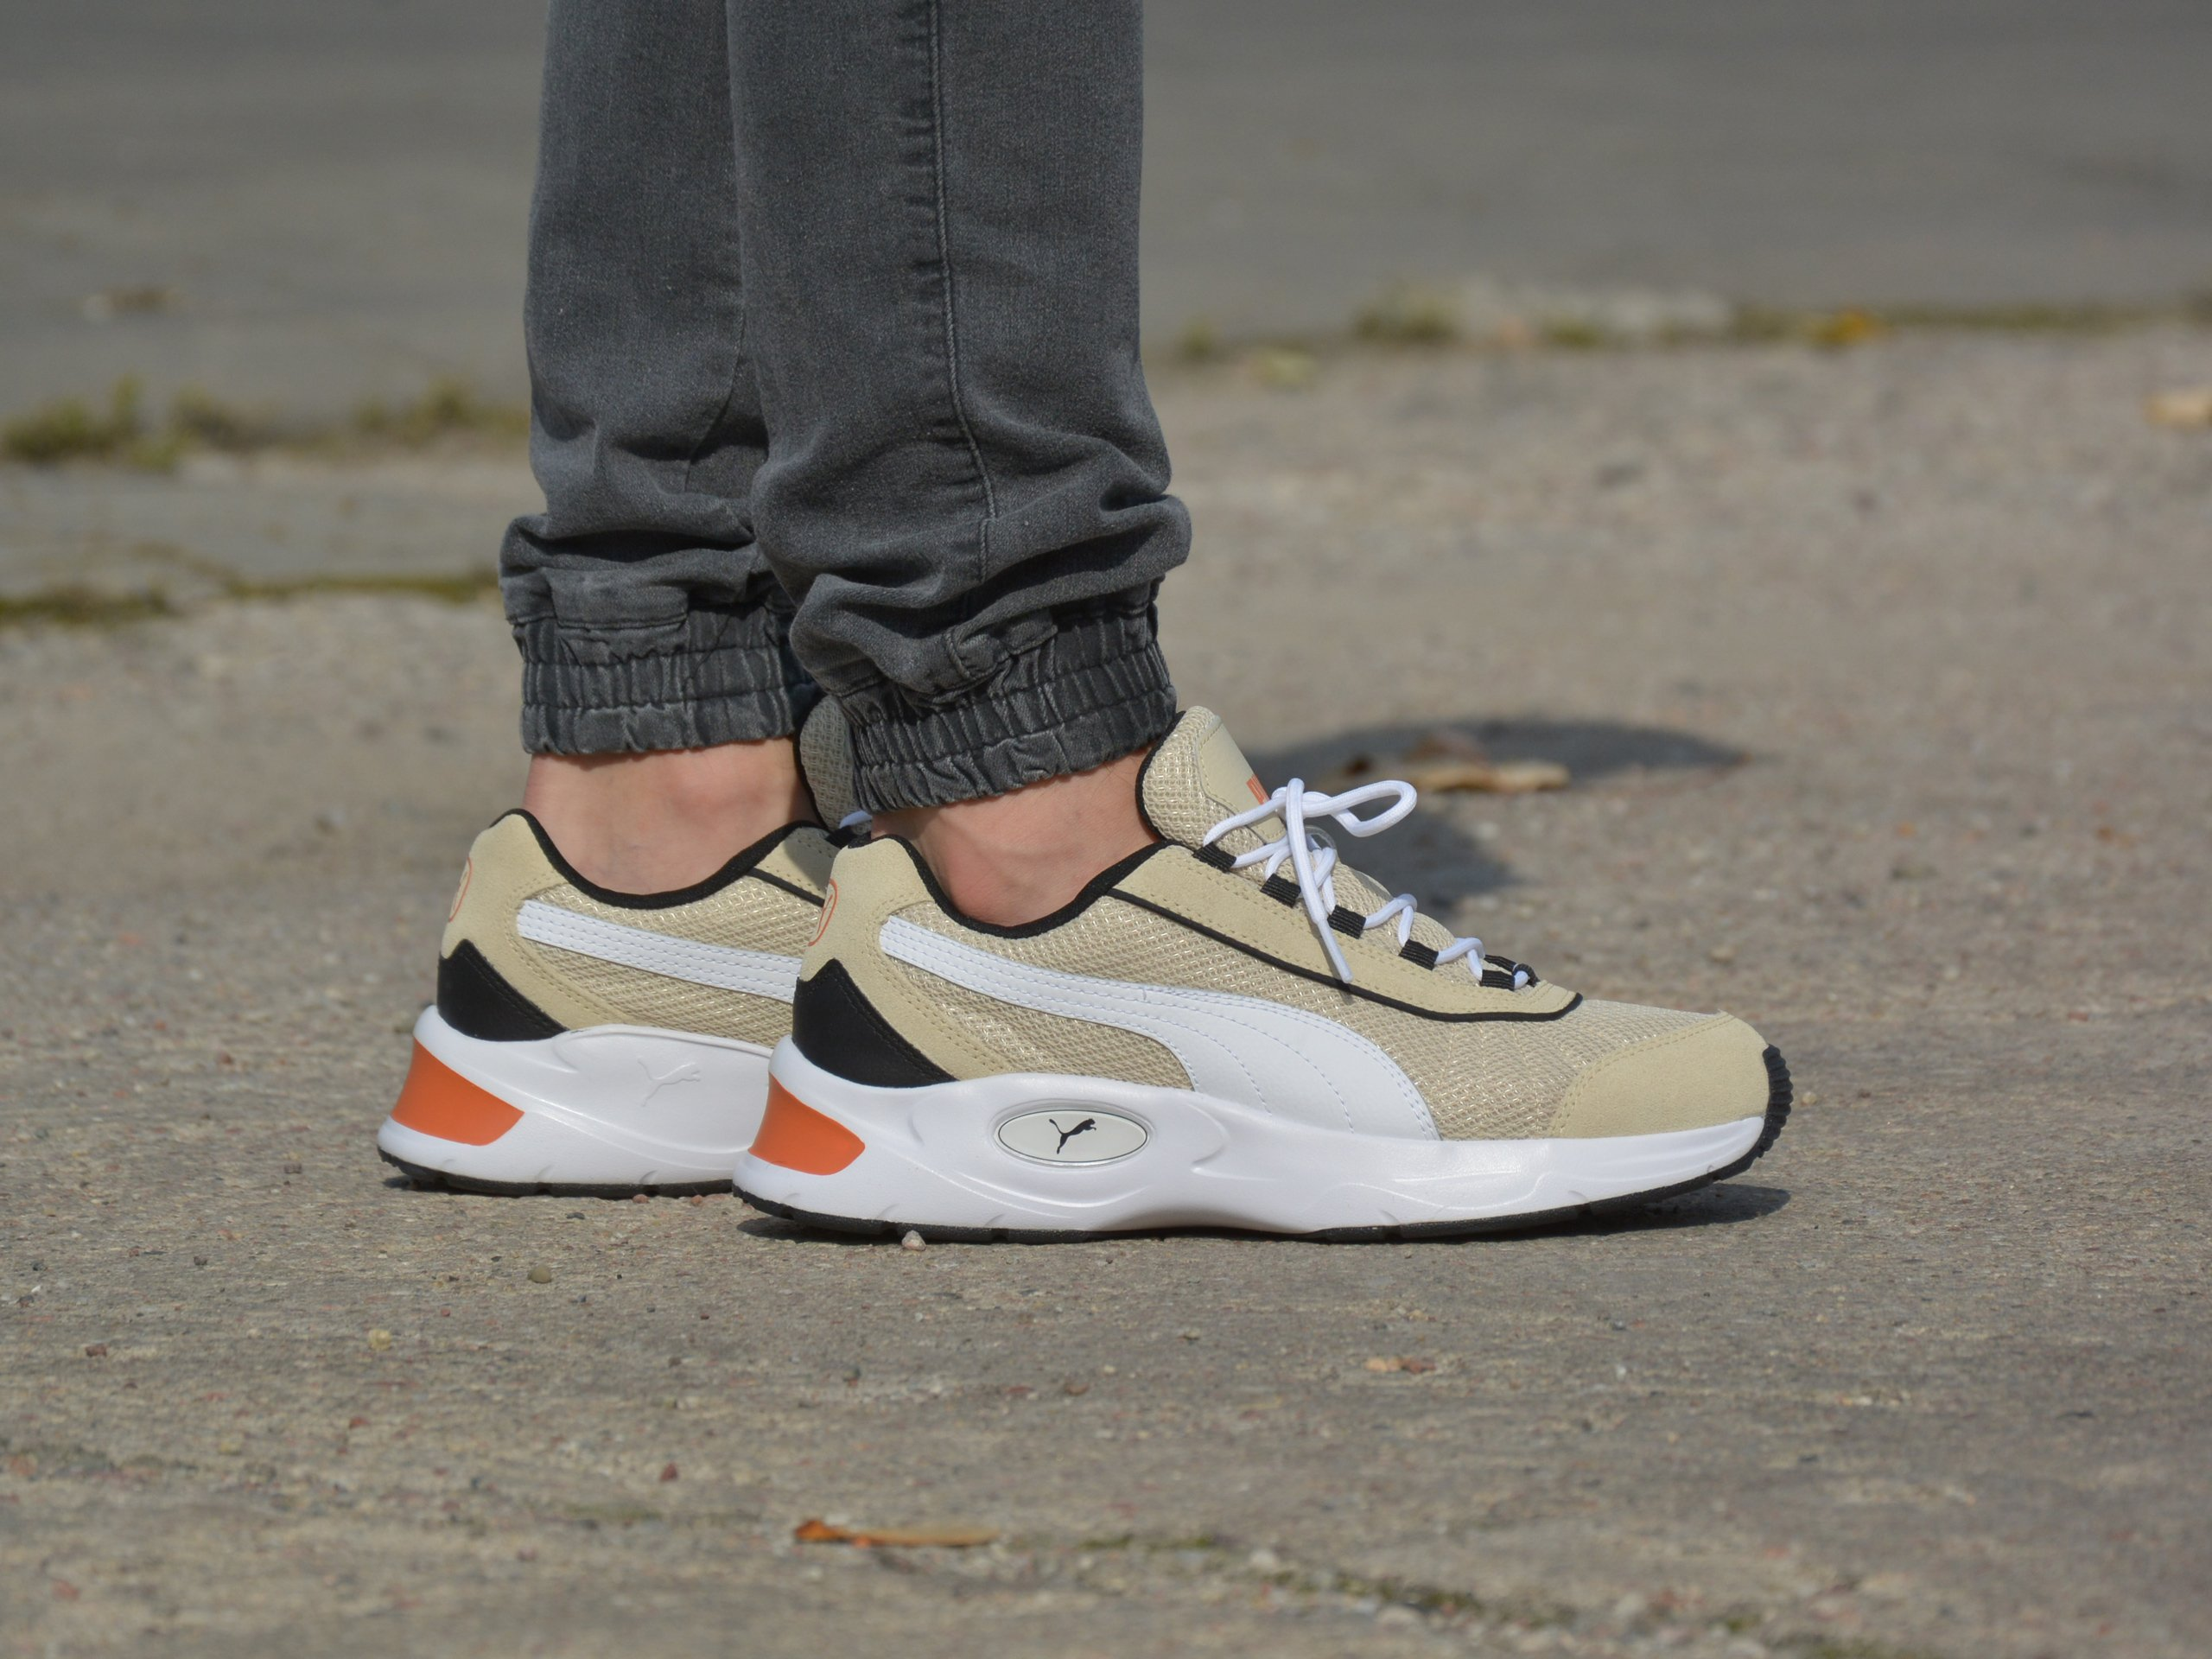 Puma - Nucleus Lux 370481-02 - Sneakers - White / Beige | Mens ...